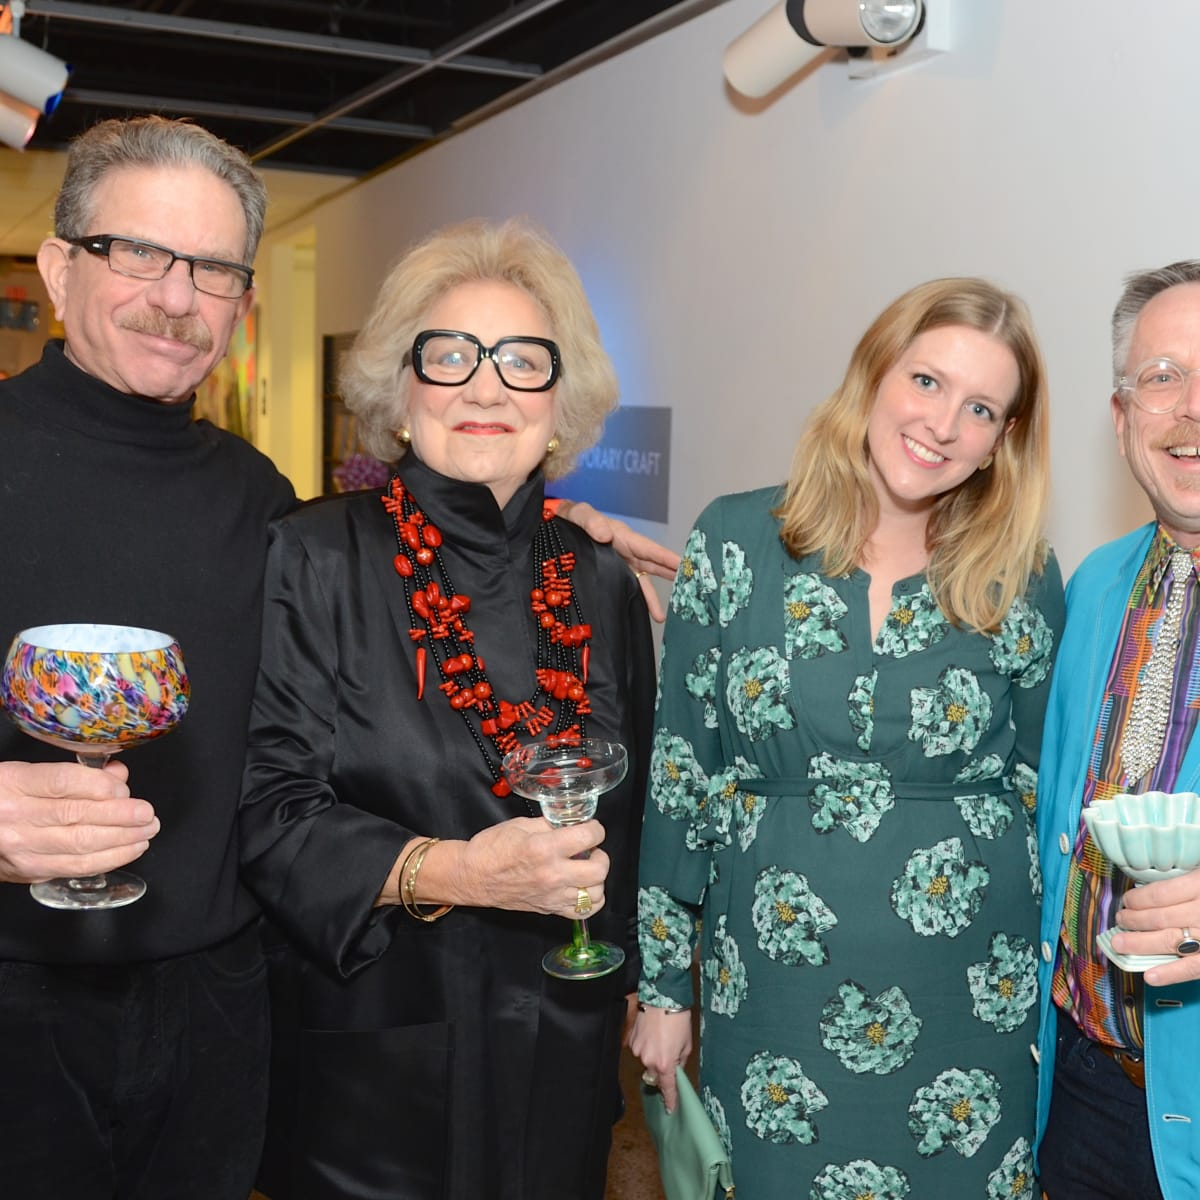 Center for Contemporary Craft, Margarita Madness, Jan. 2016, Marshal Lightman, Phyllis Childress, Rosemary Price, Edward Lane McCartney